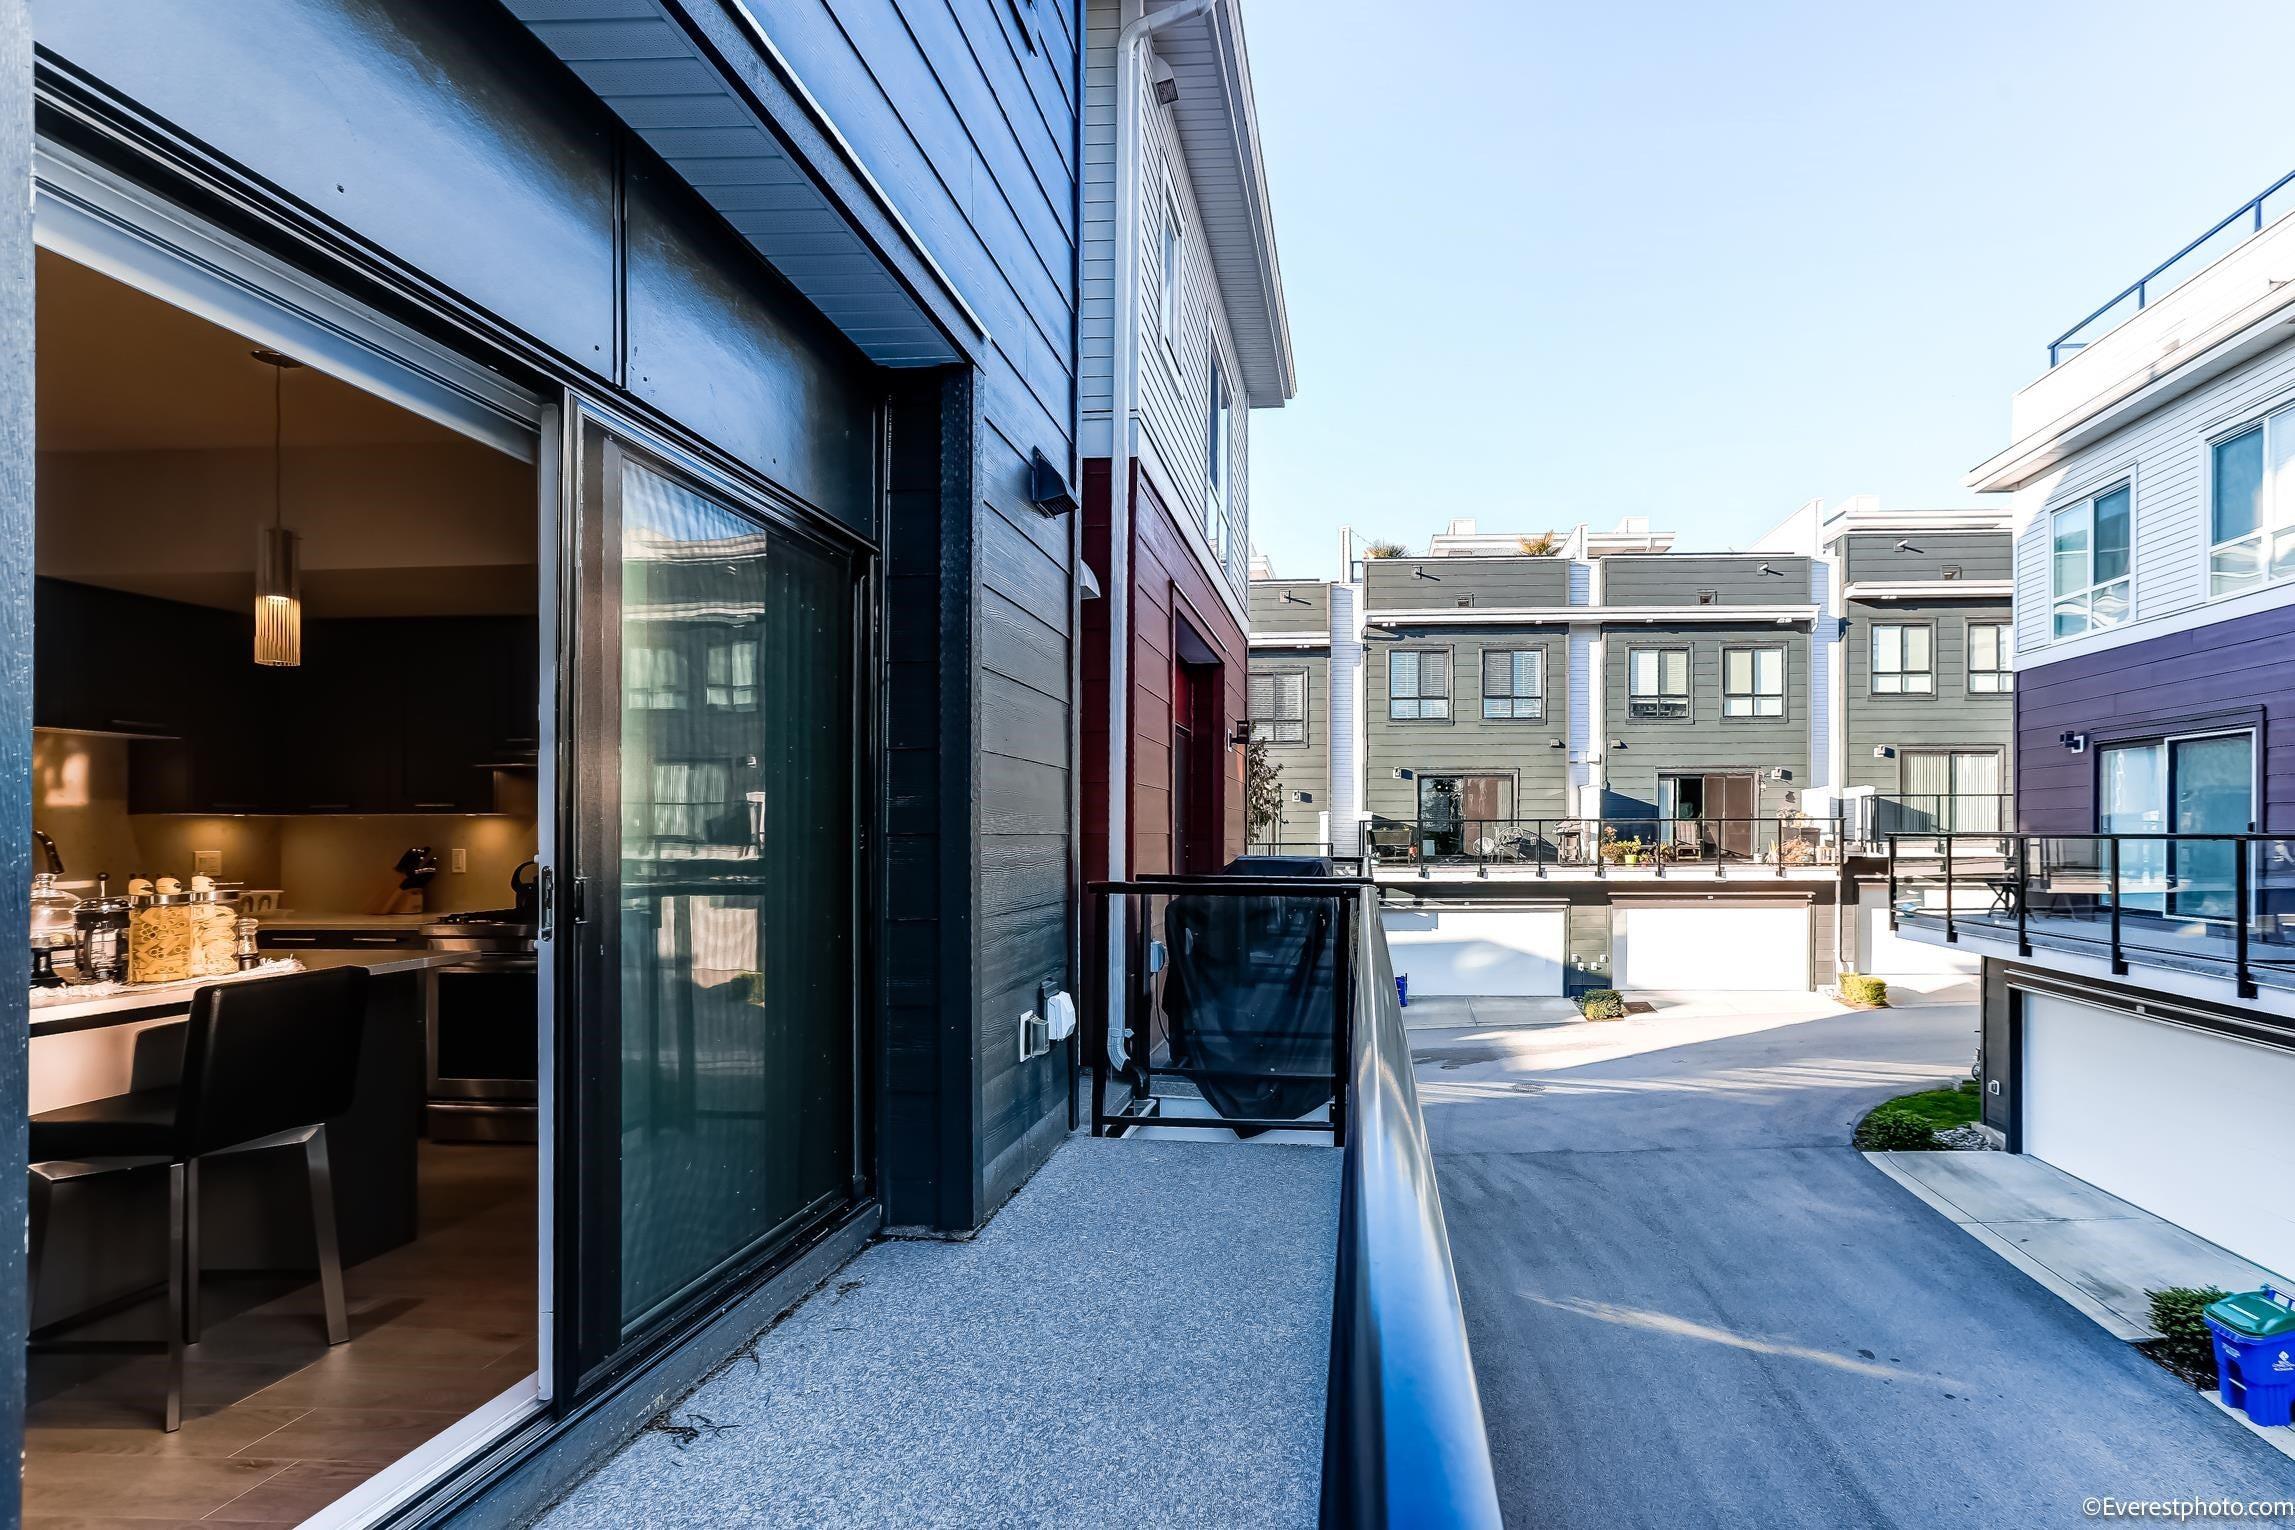 186 2277 OAK MEADOWS DRIVE - Grandview Surrey Townhouse for sale, 3 Bedrooms (R2624950) - #26